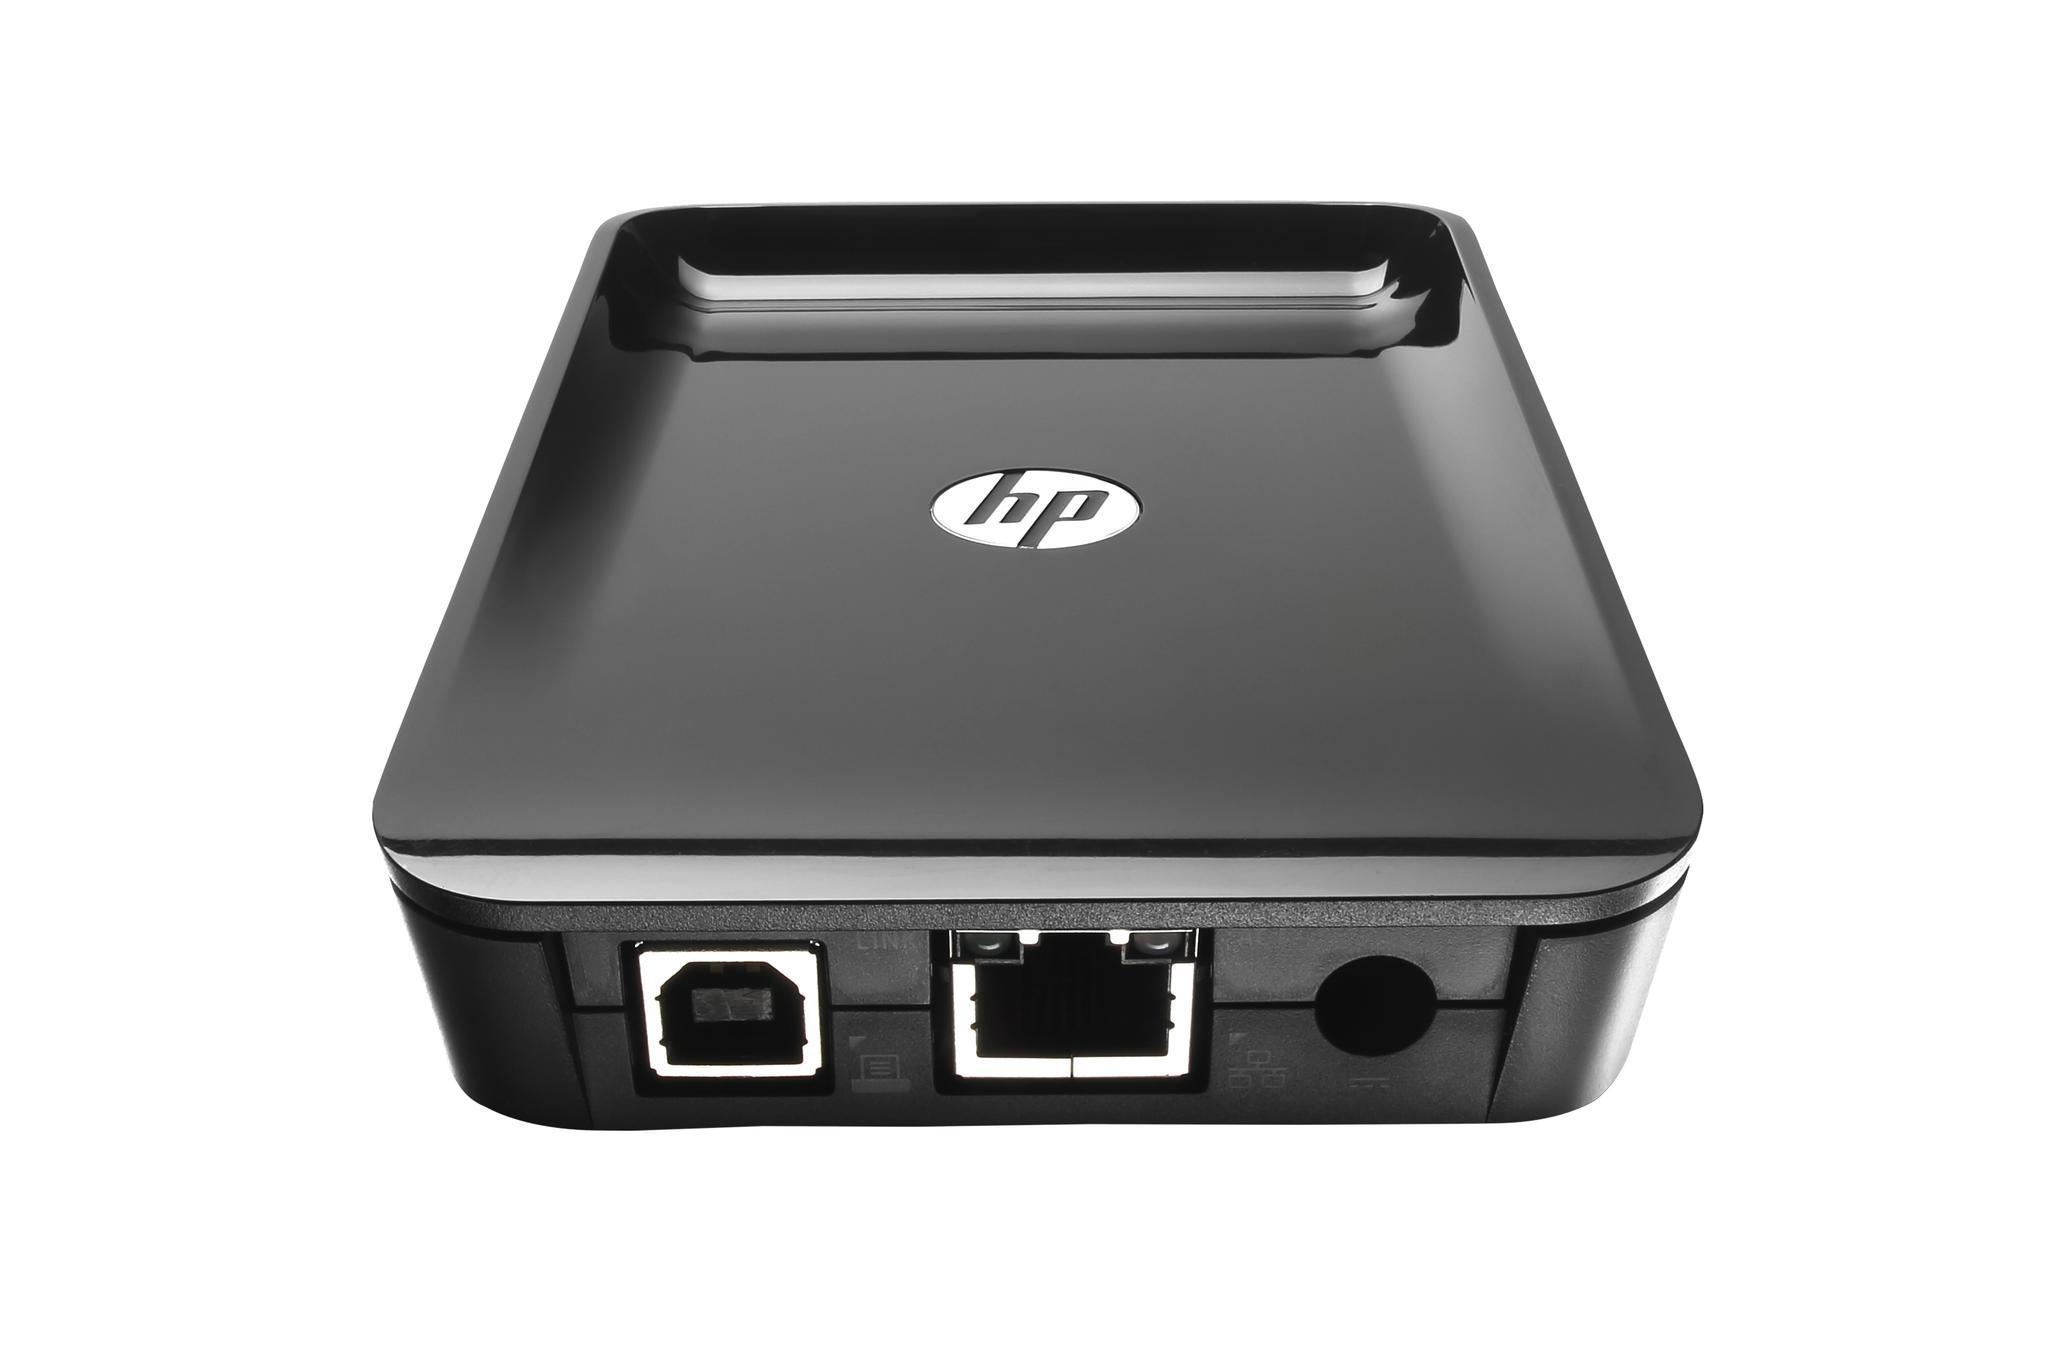 HP Jetdirect 2900nw printserver